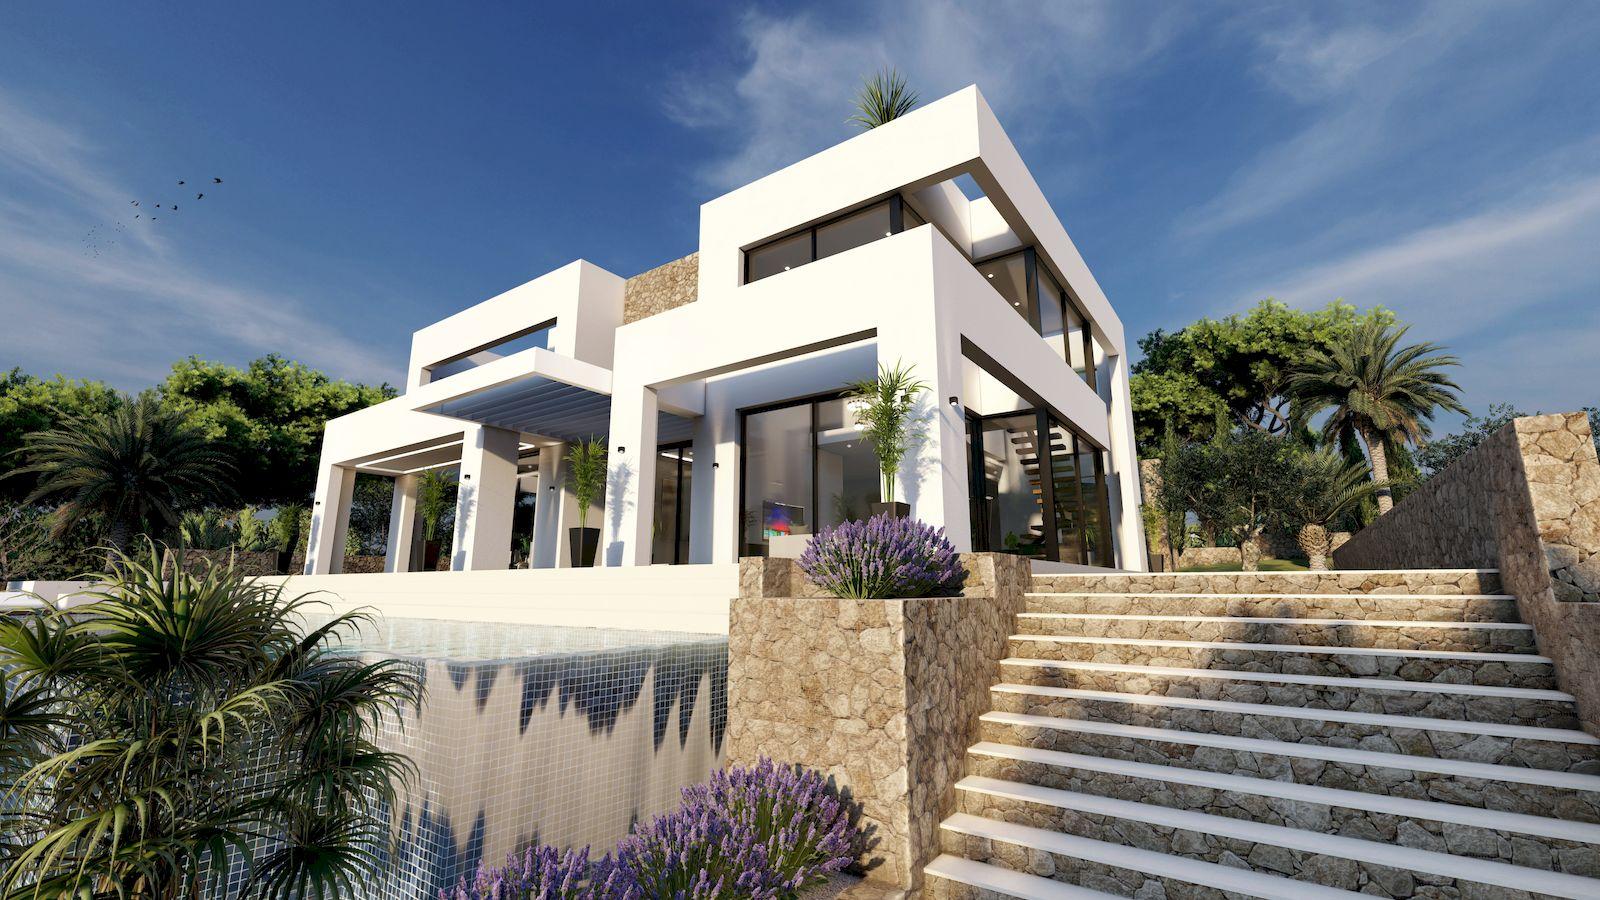 Modern New Construction Villa for Sale in Benissa - Costa Blanca